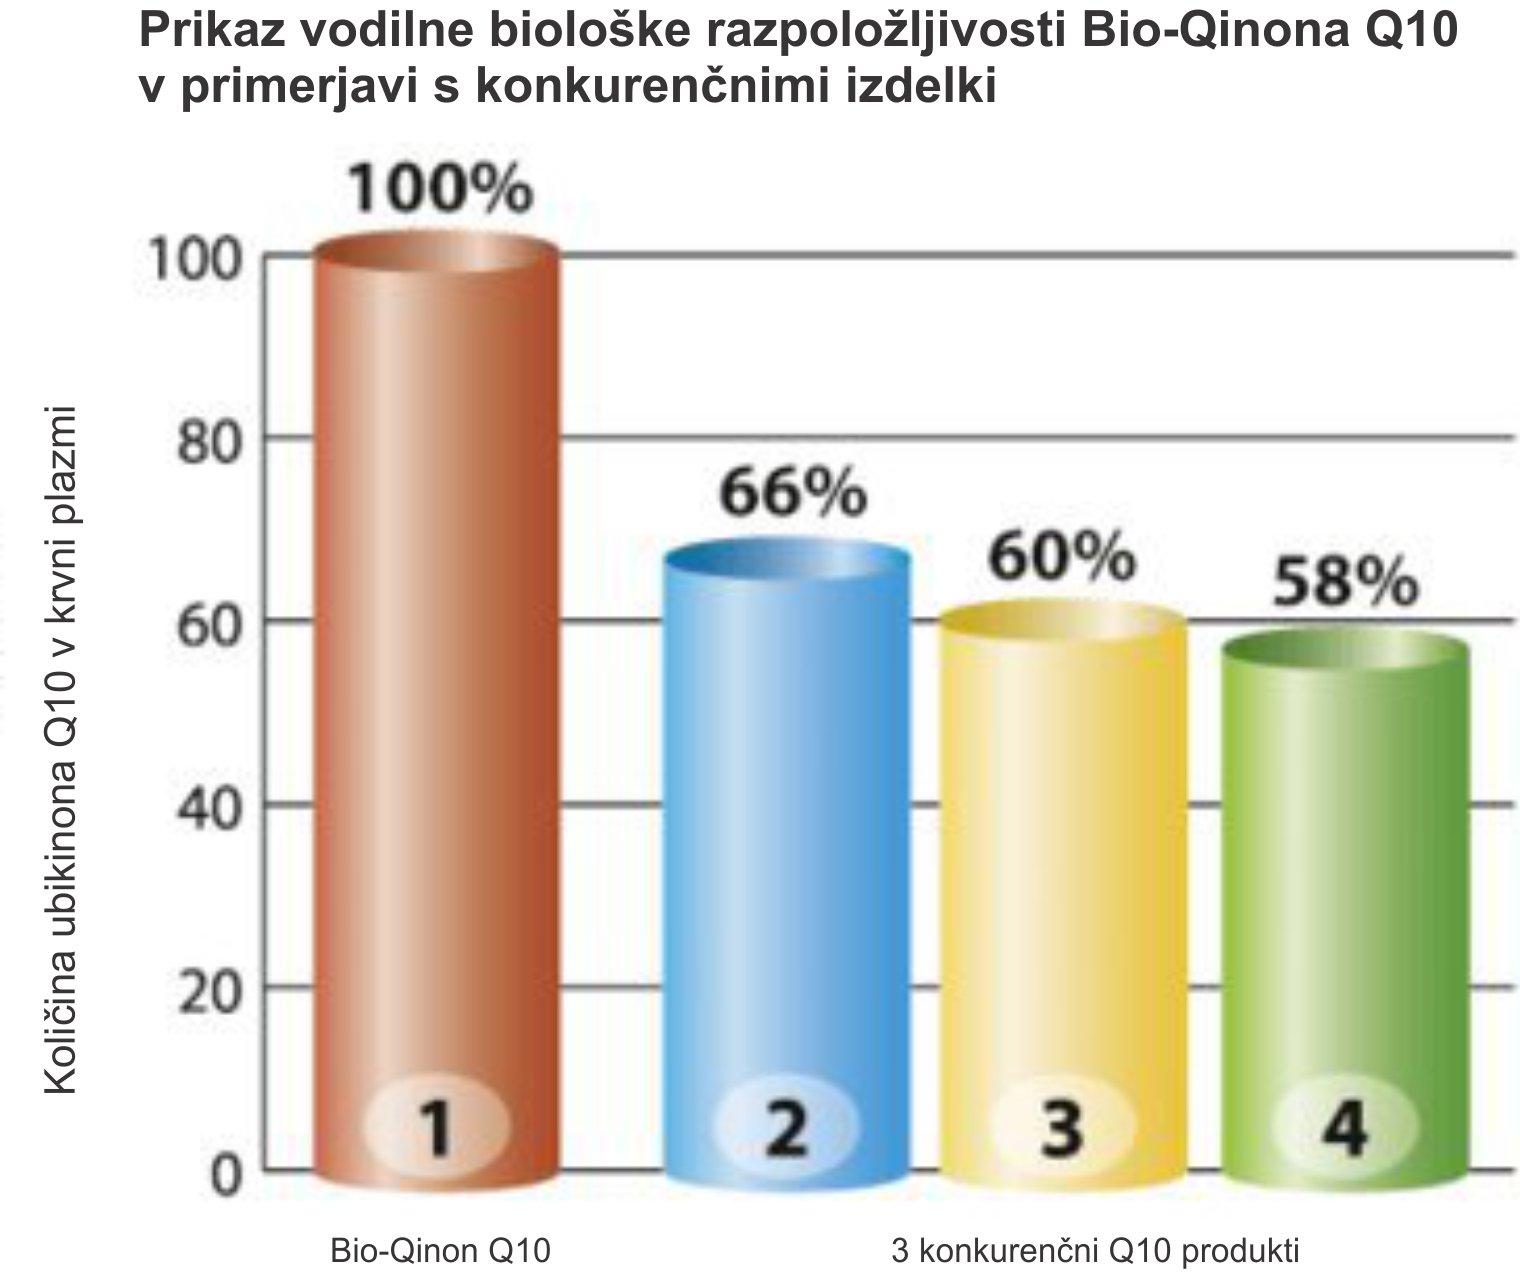 Bio-Qinon biološka vrednost